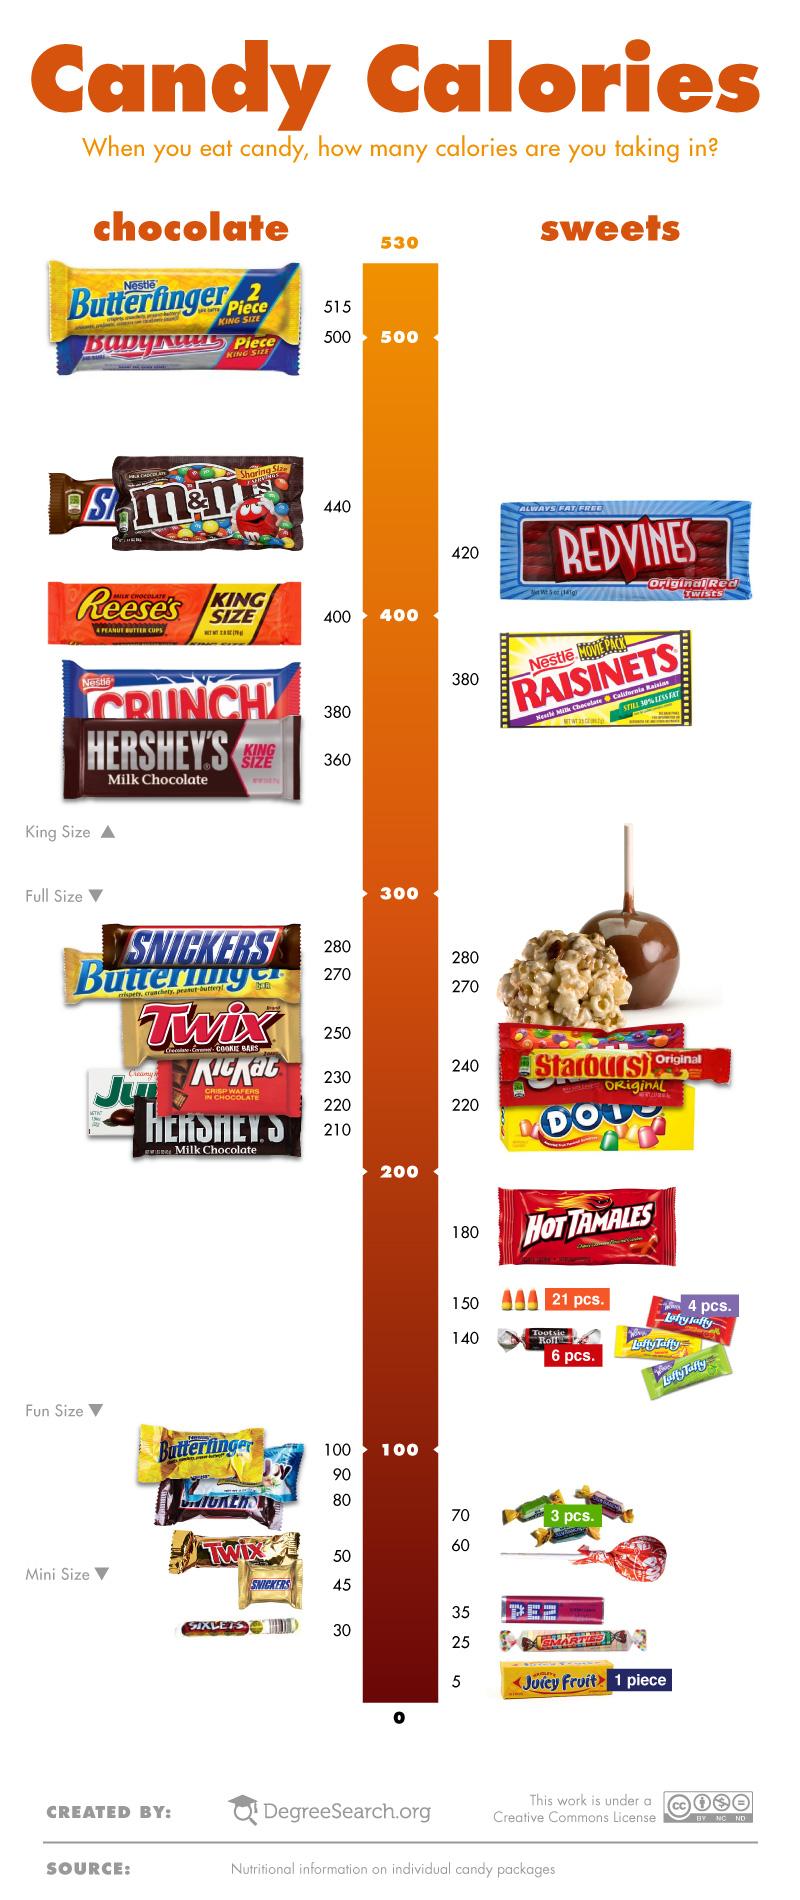 candy-calories_508b115f58af0